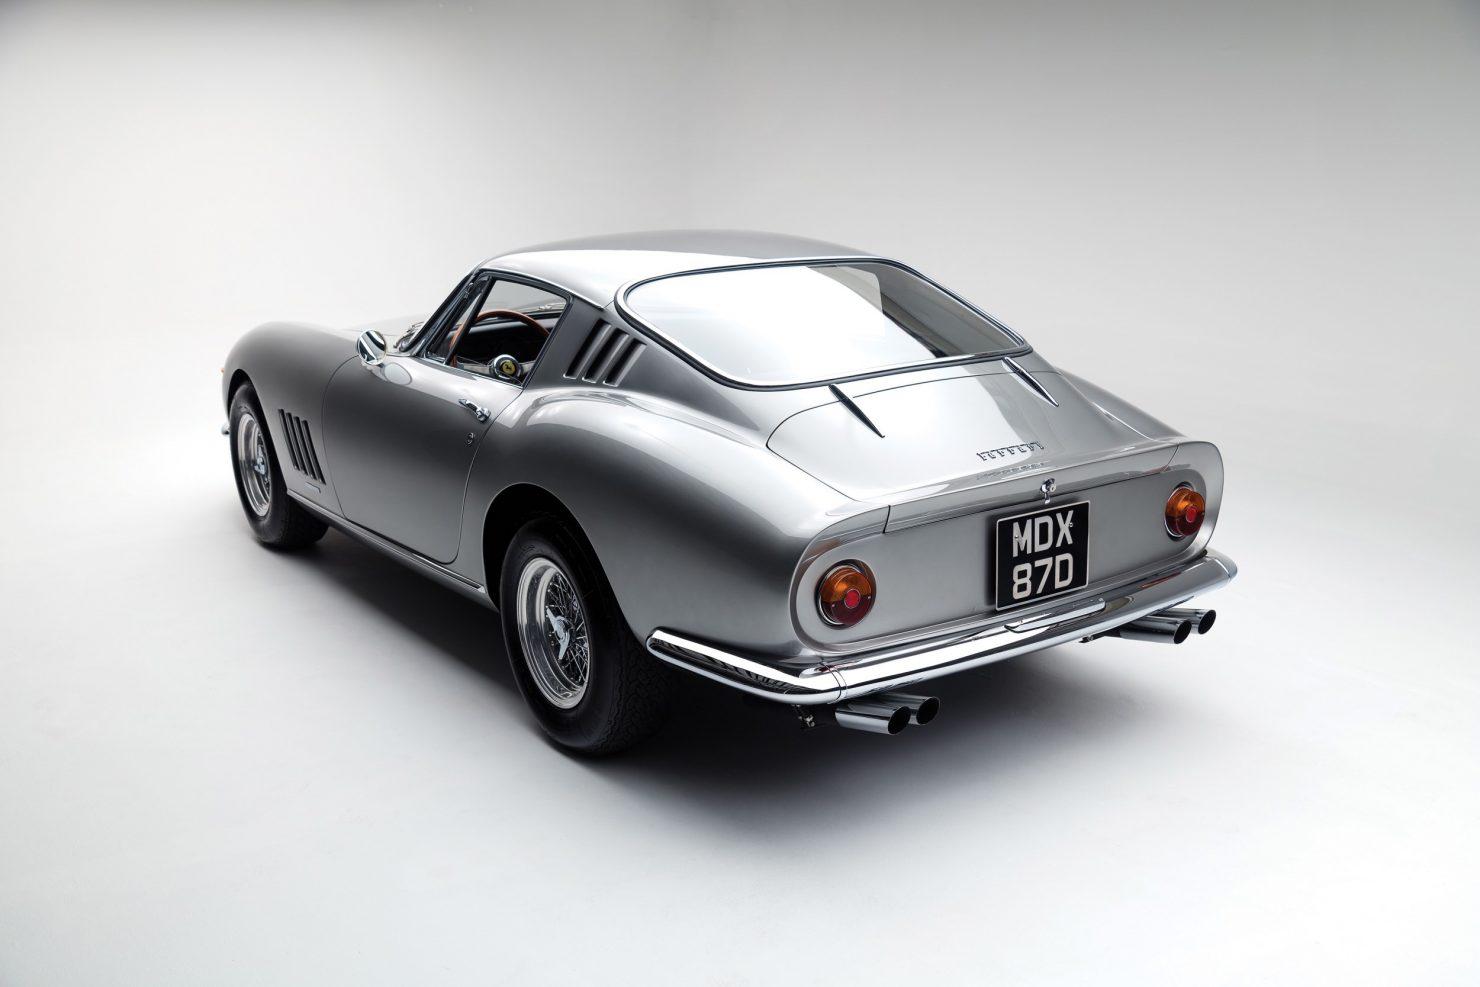 ferrari 275 gtb car 2 1480x987 - 1965 Ferrari 275 GTB/6C Alloy